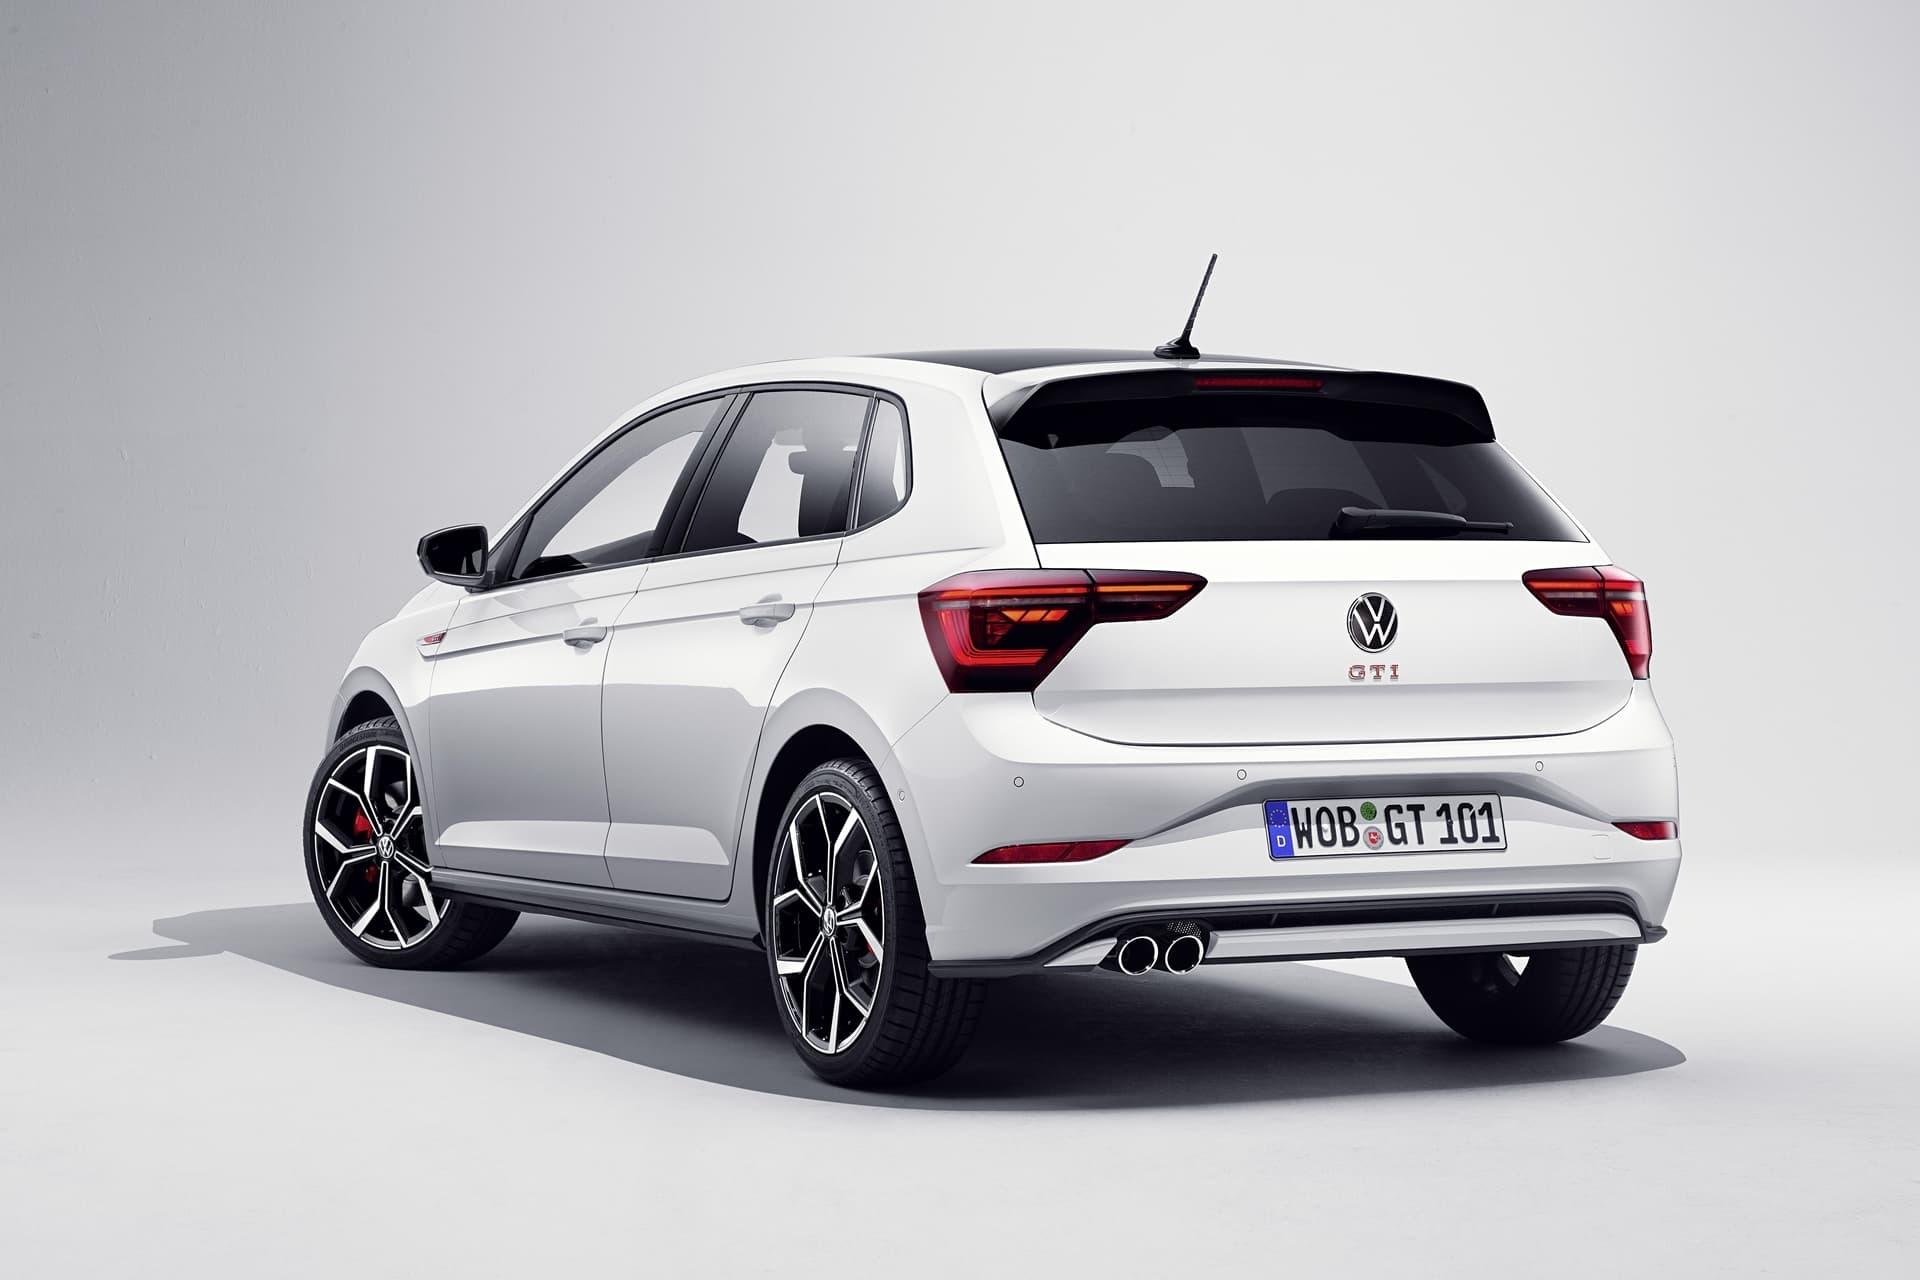 Volkswagen Polo Gti 2022 0621 017